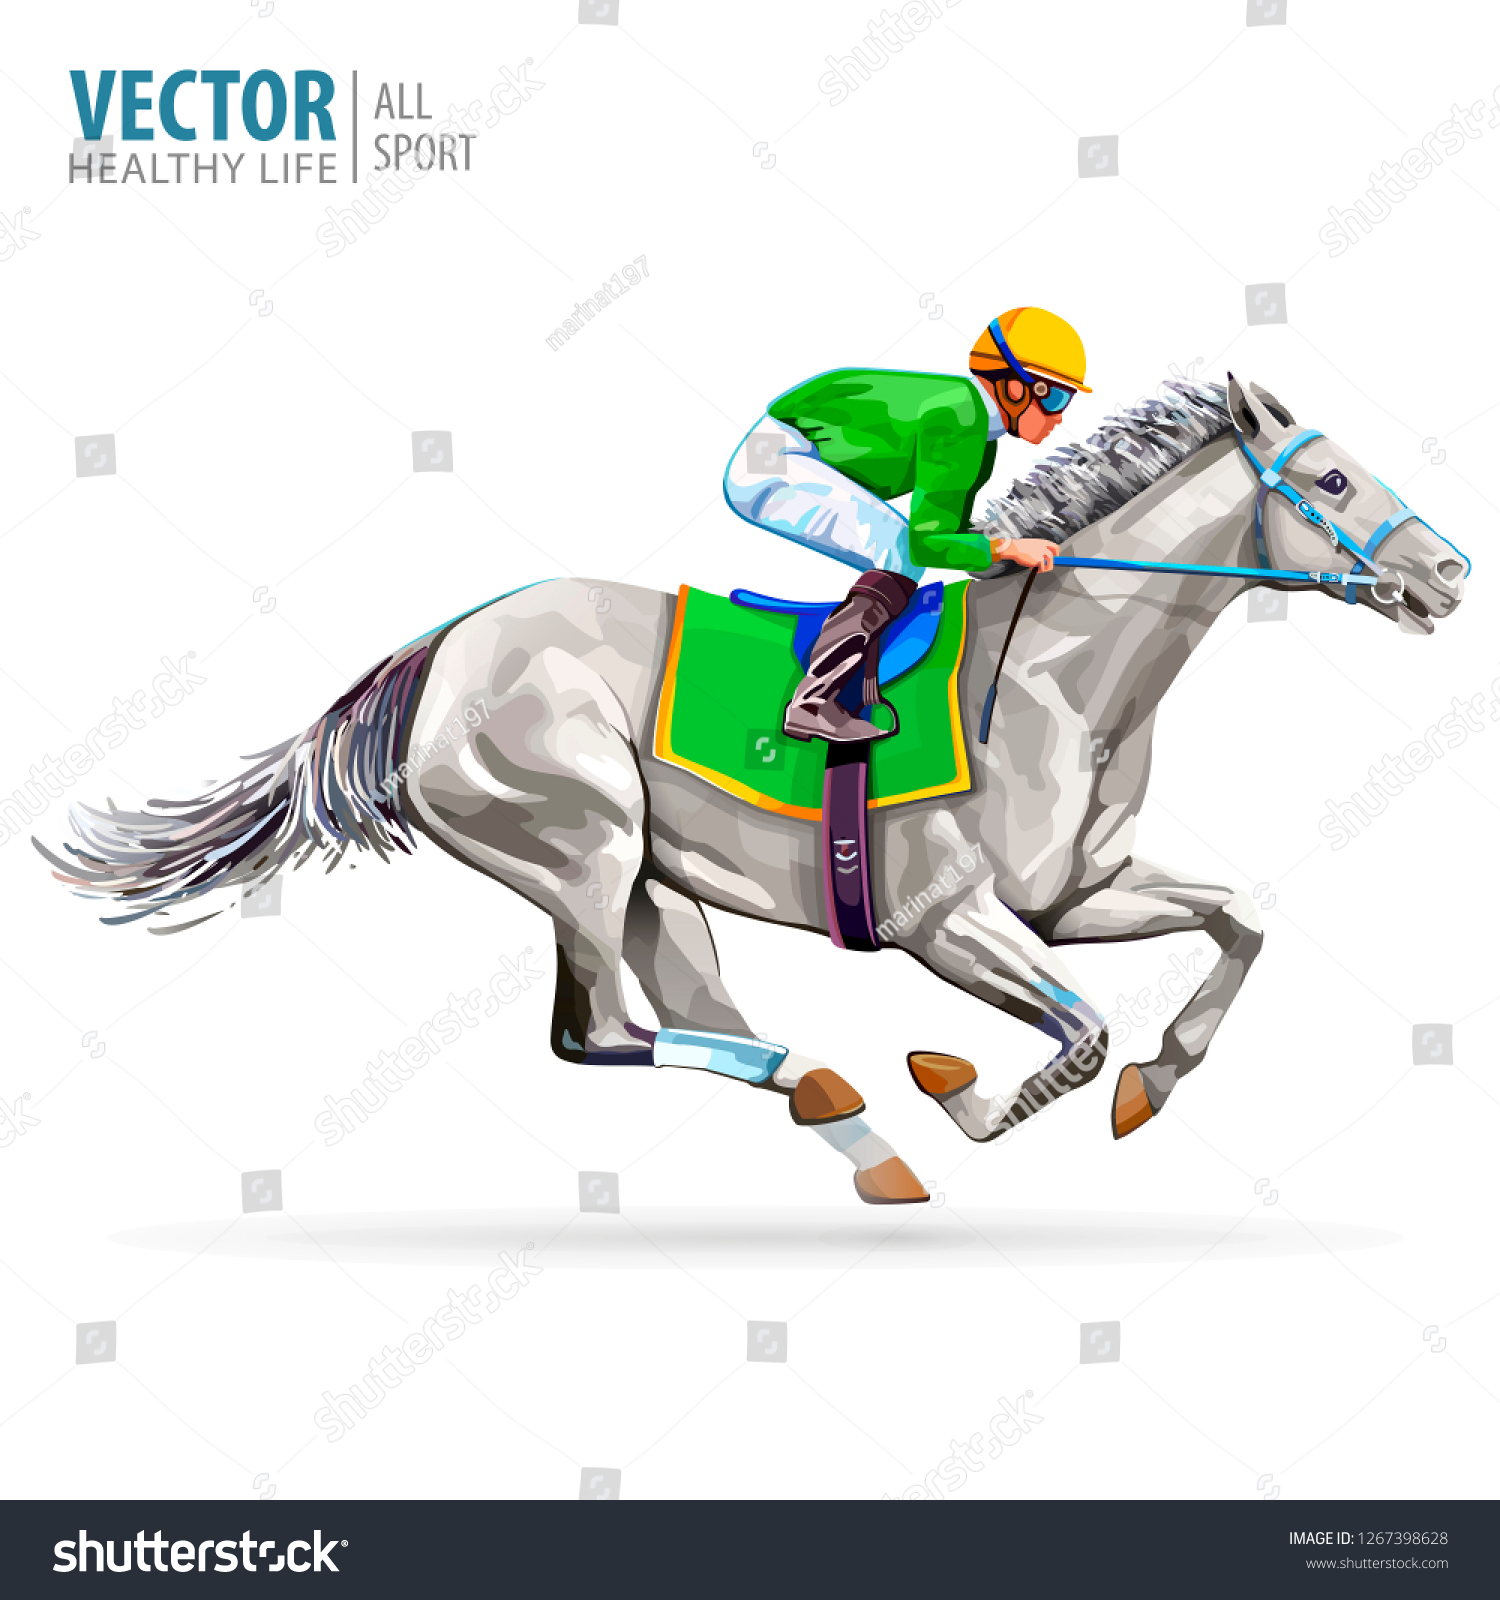 Jockey on racing horse champion hippodrome racetrack jump racetrack horse riding